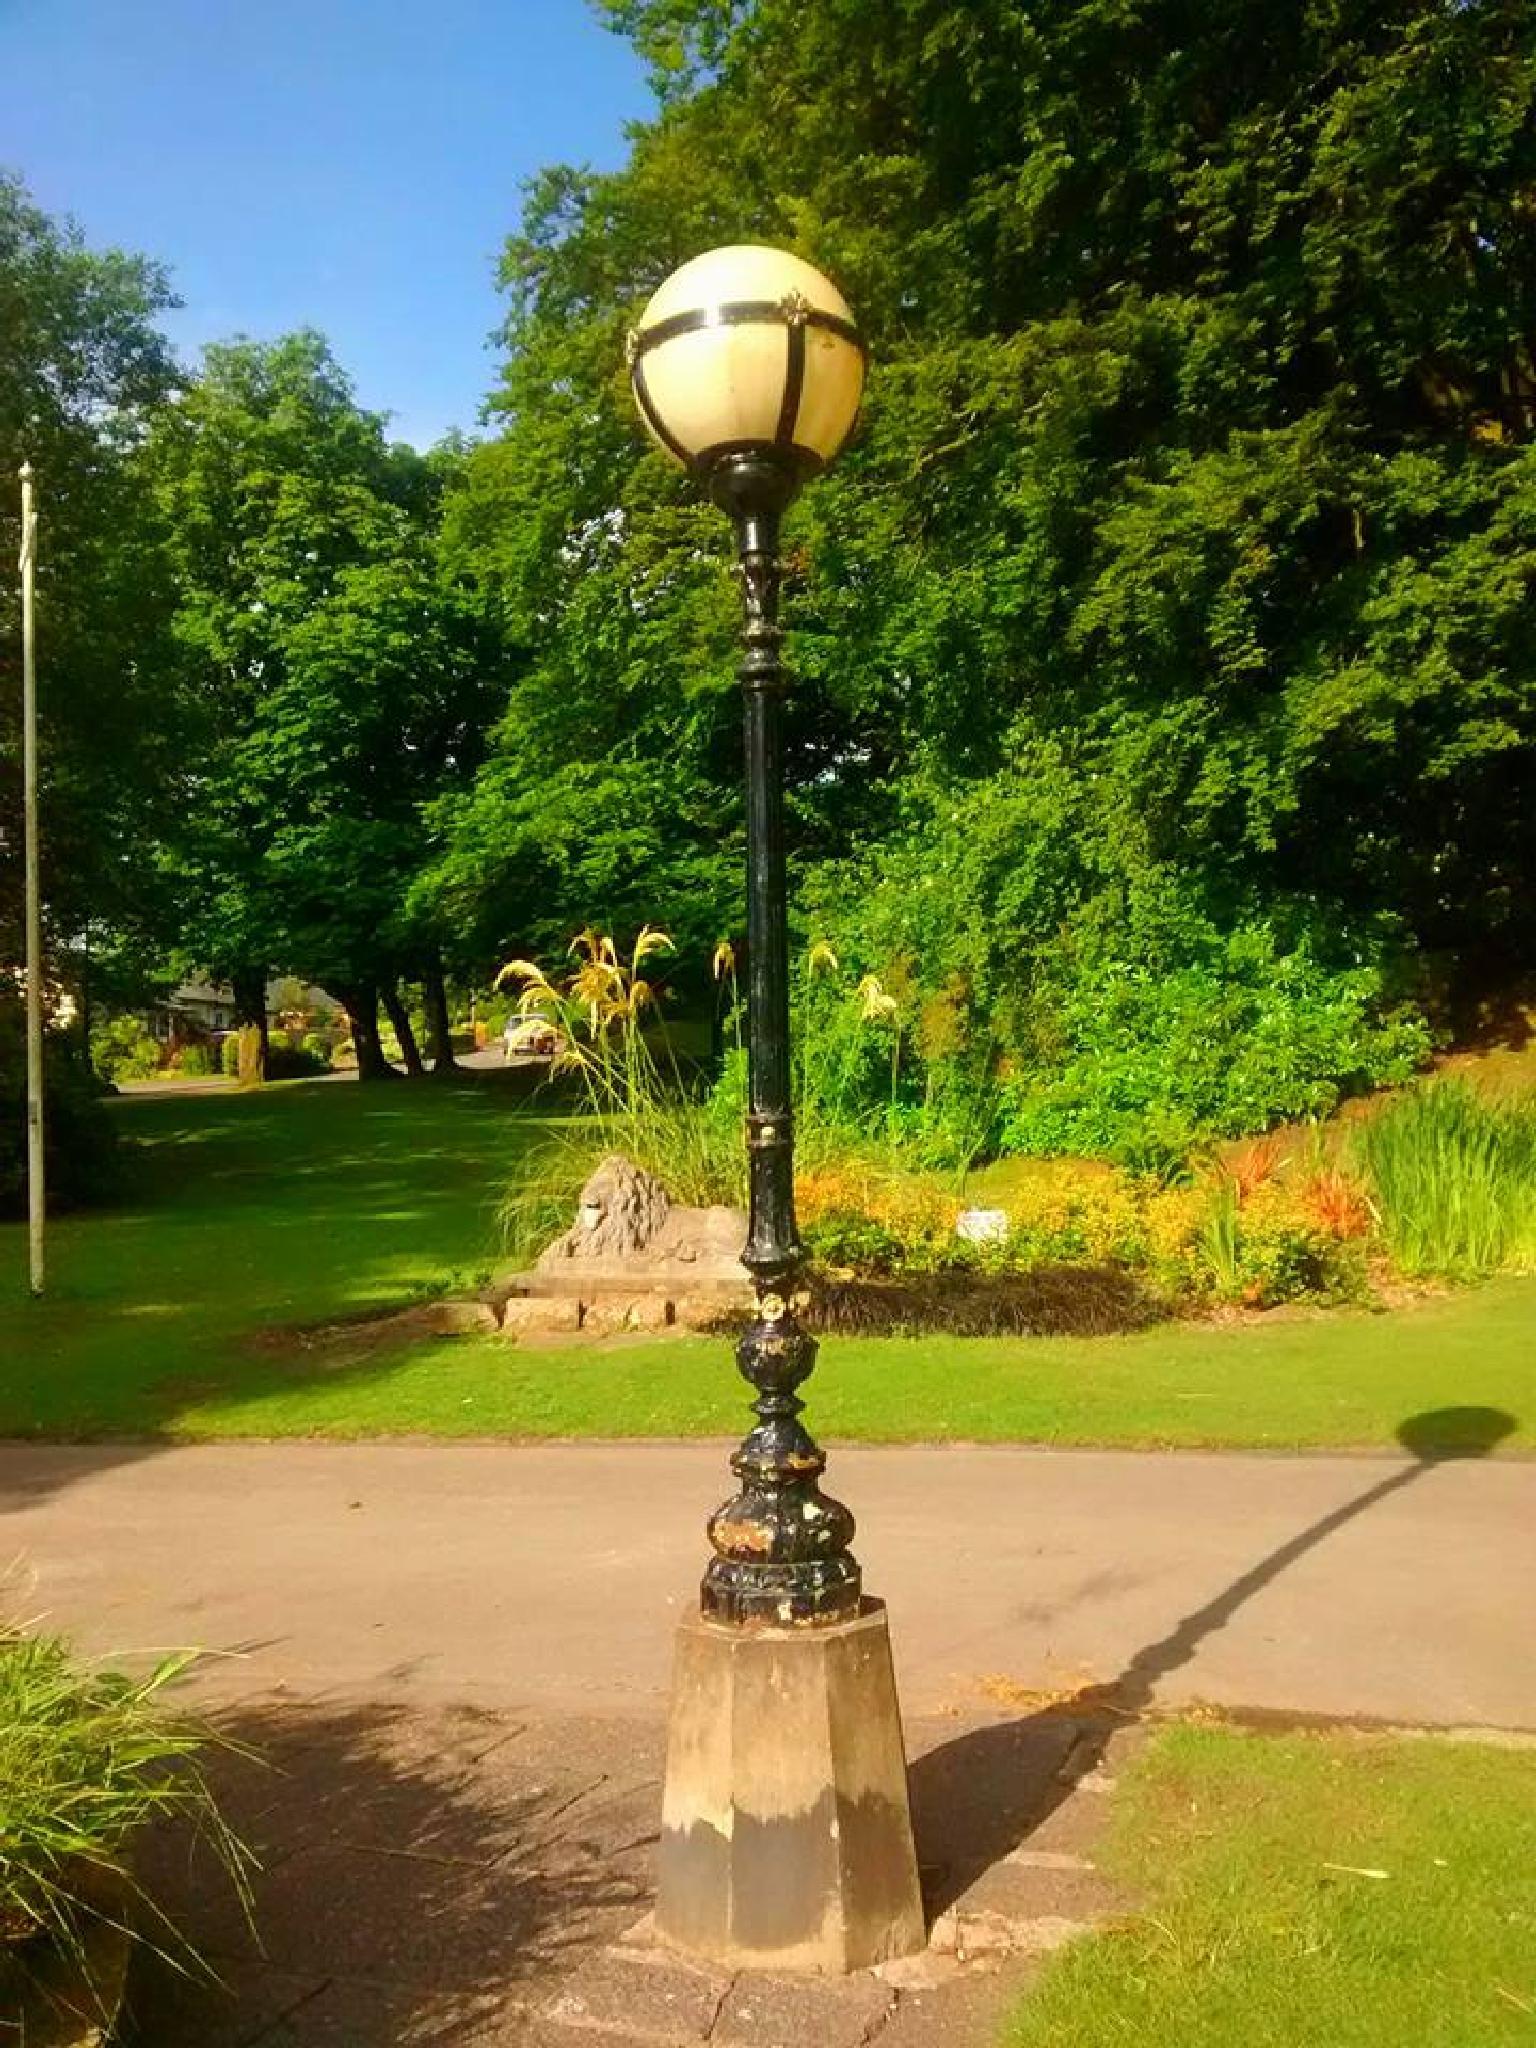 Howard Park Glossop Derbyshire by dysonjohn64